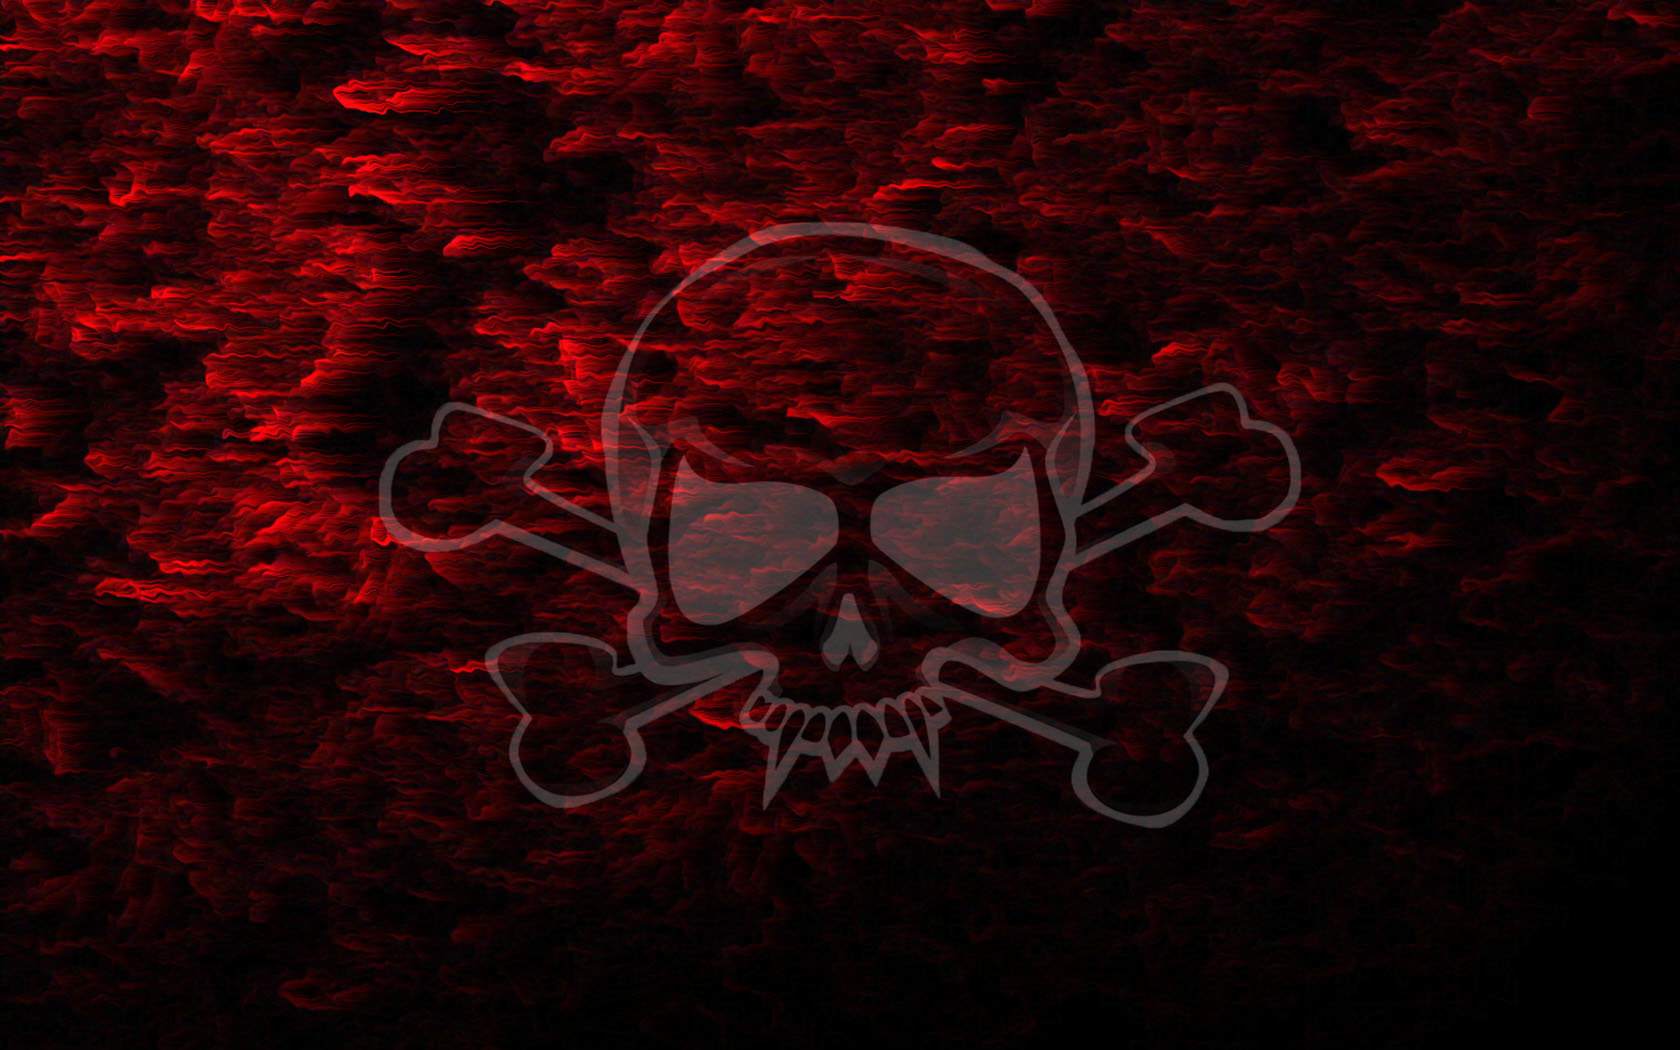 47 Red Skull Wallpaper On Wallpapersafari